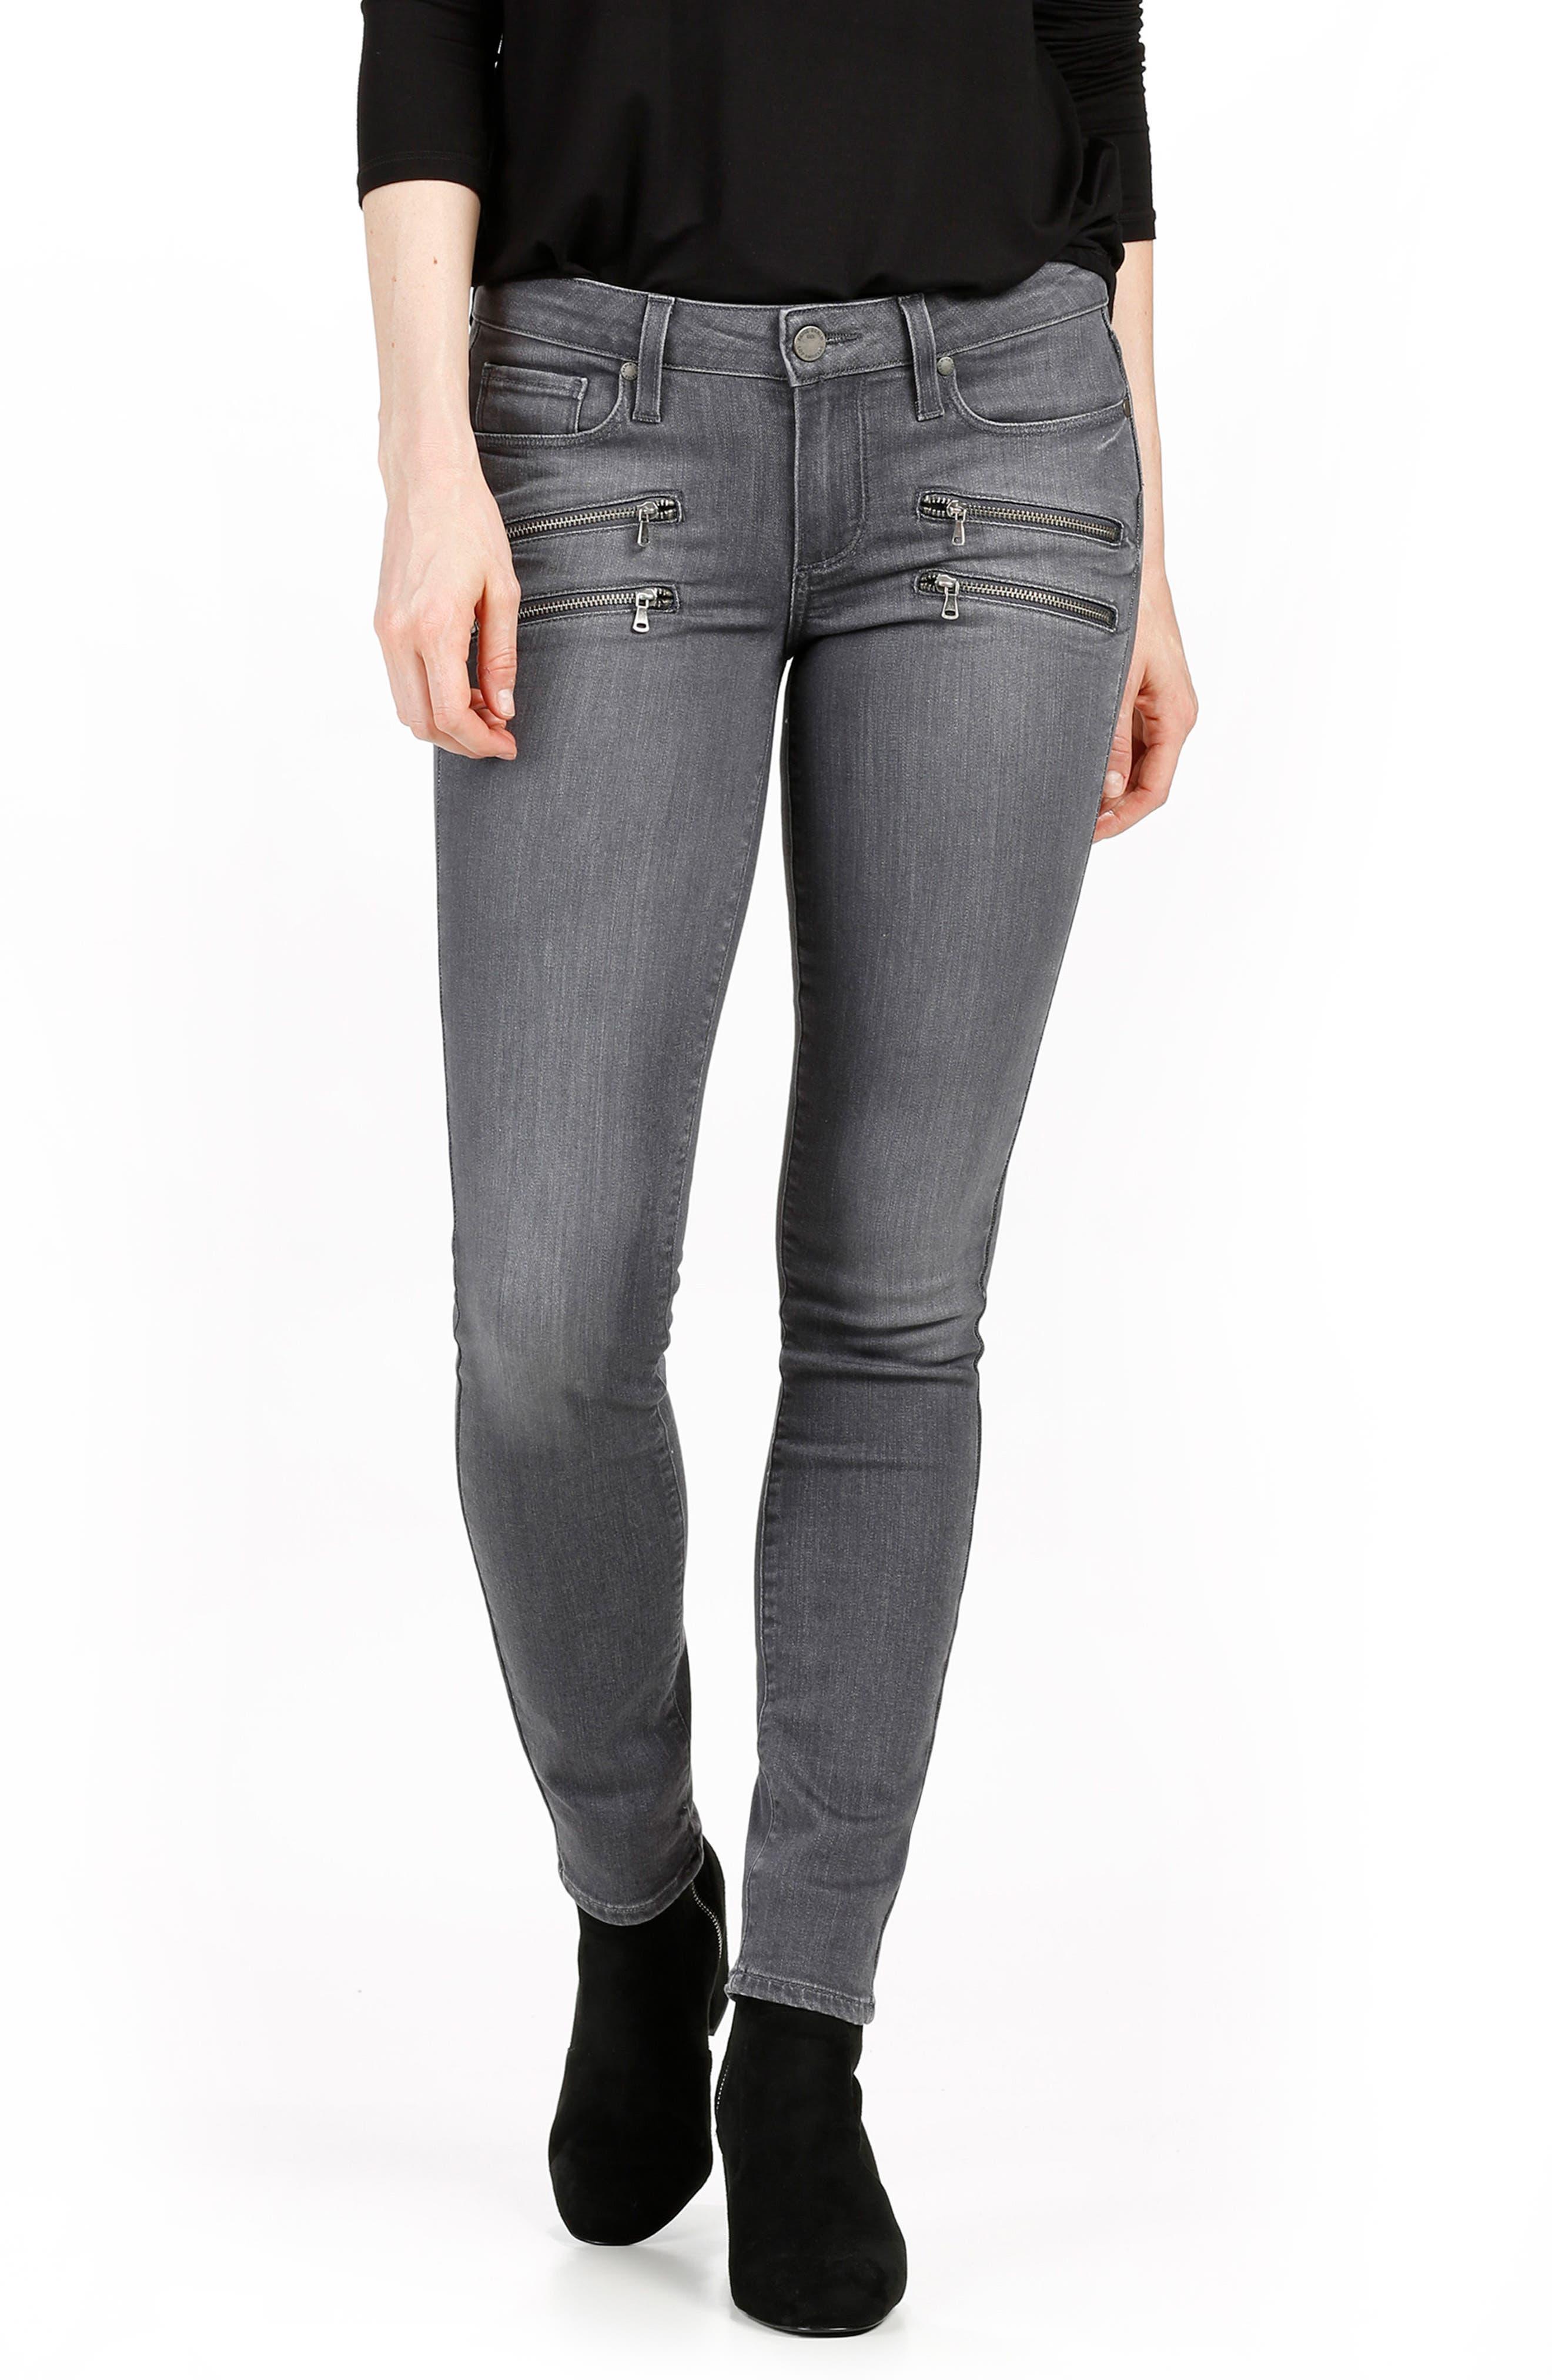 PAIGE Transcend - Edgemont Ultra Skinny Jeans (Watson Grey)